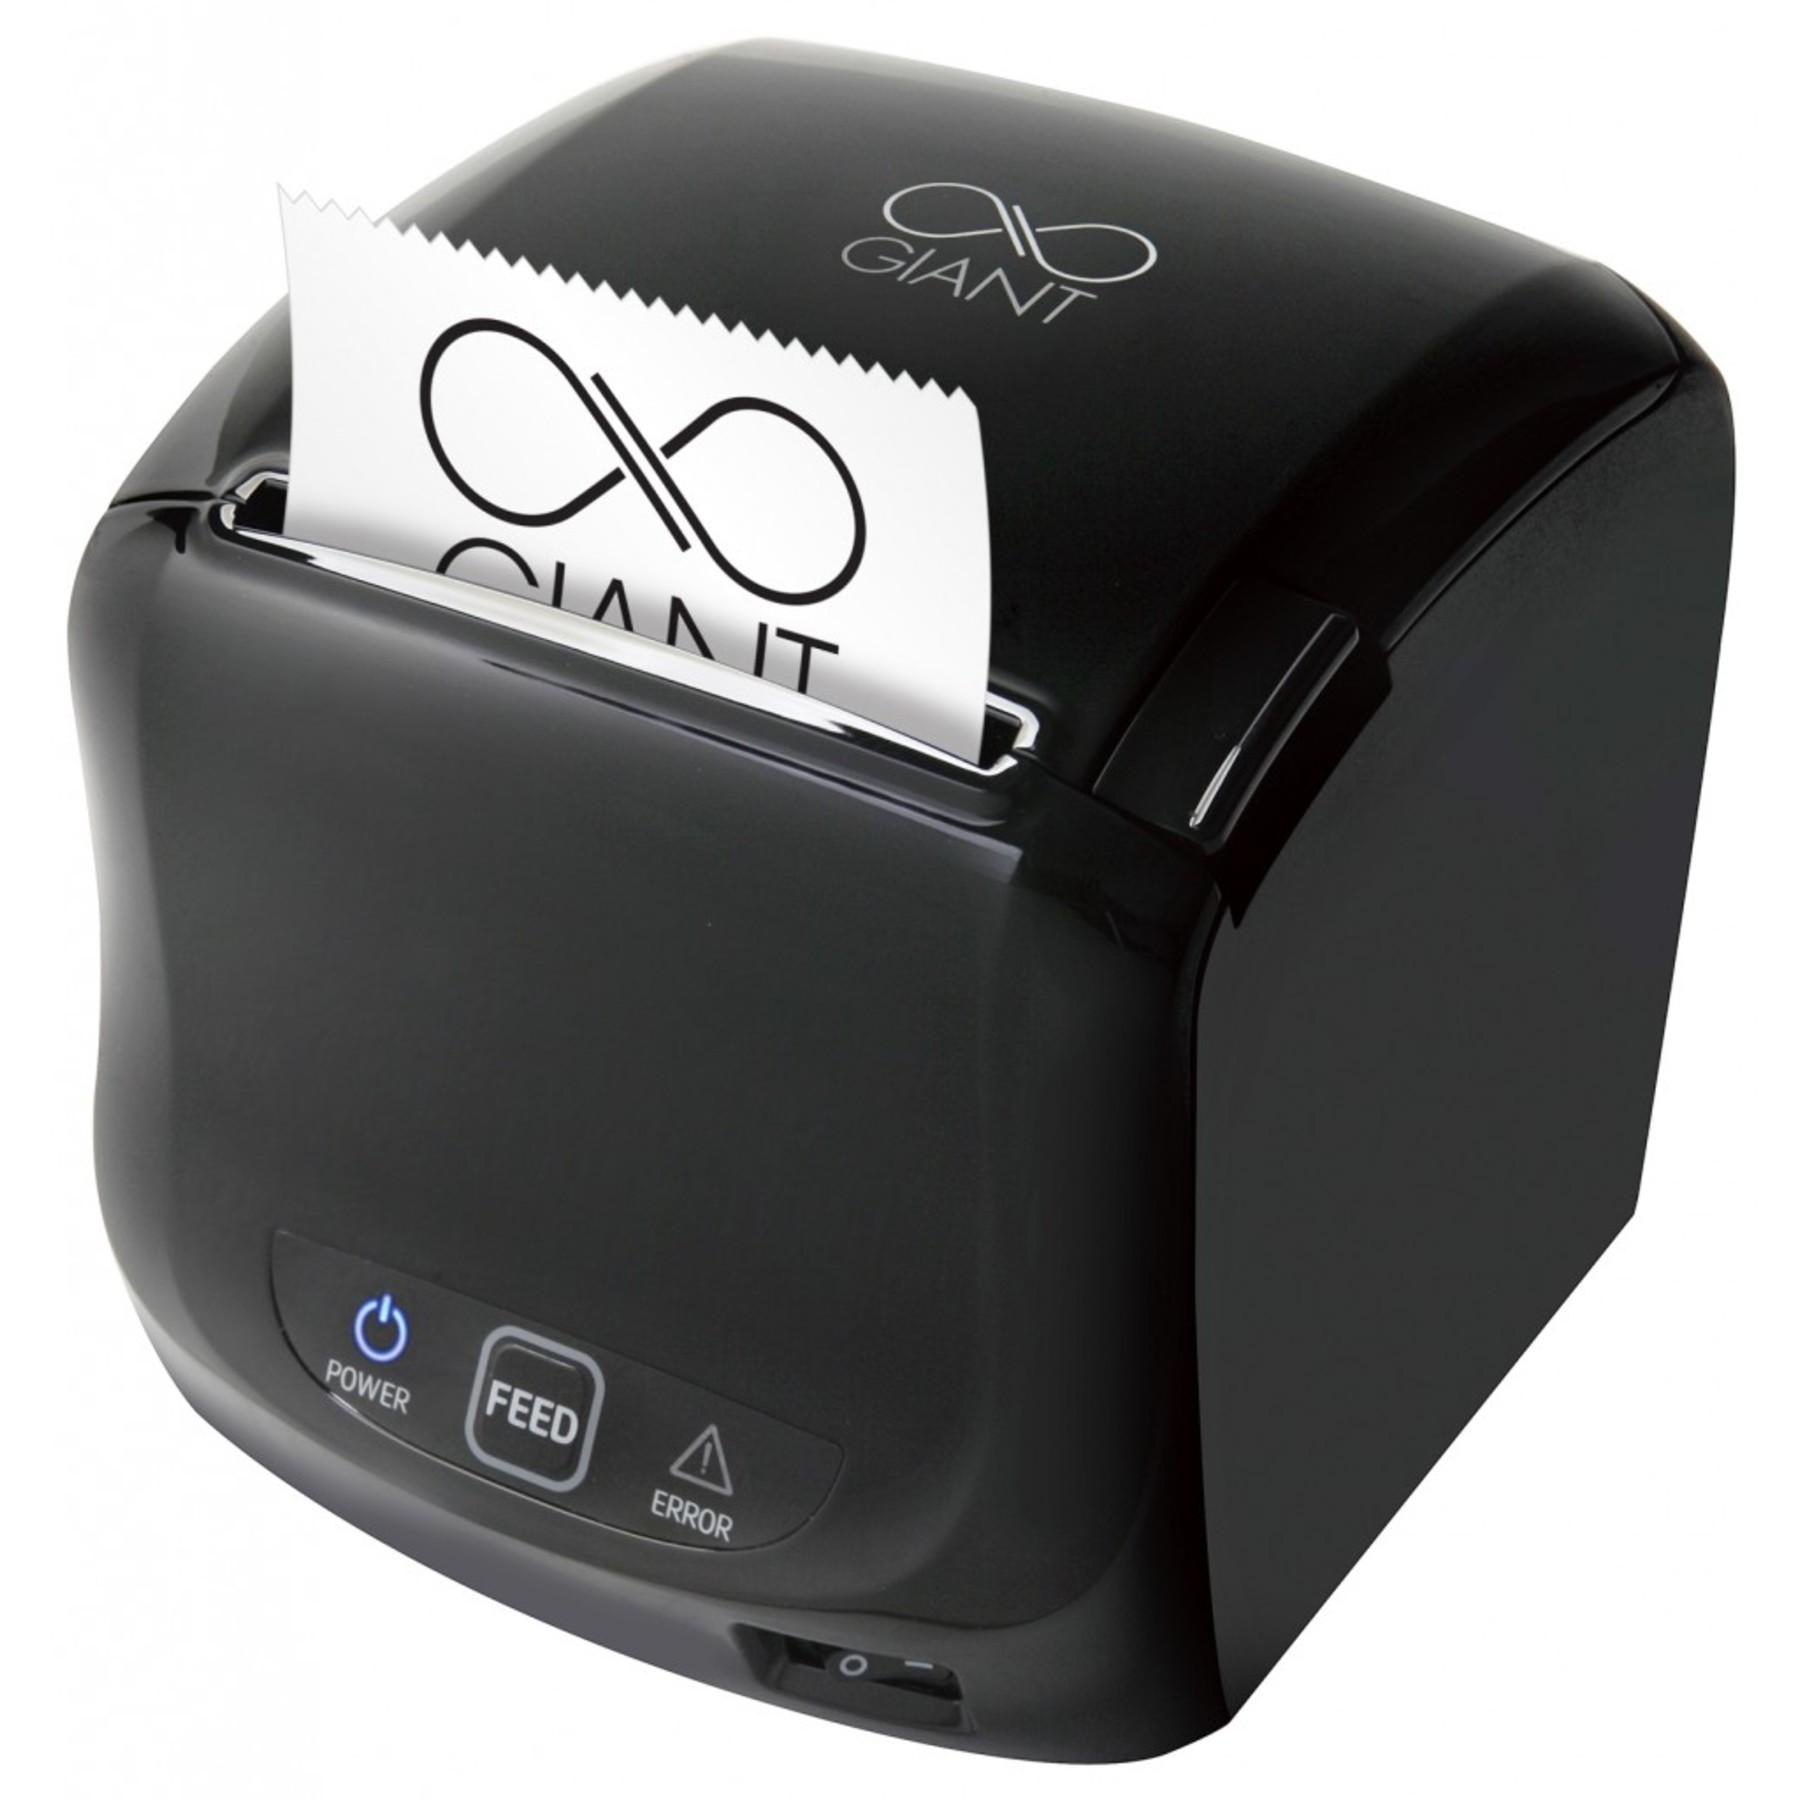 Sam4s Giant 100 Black Thermal Receipt Printer Cash